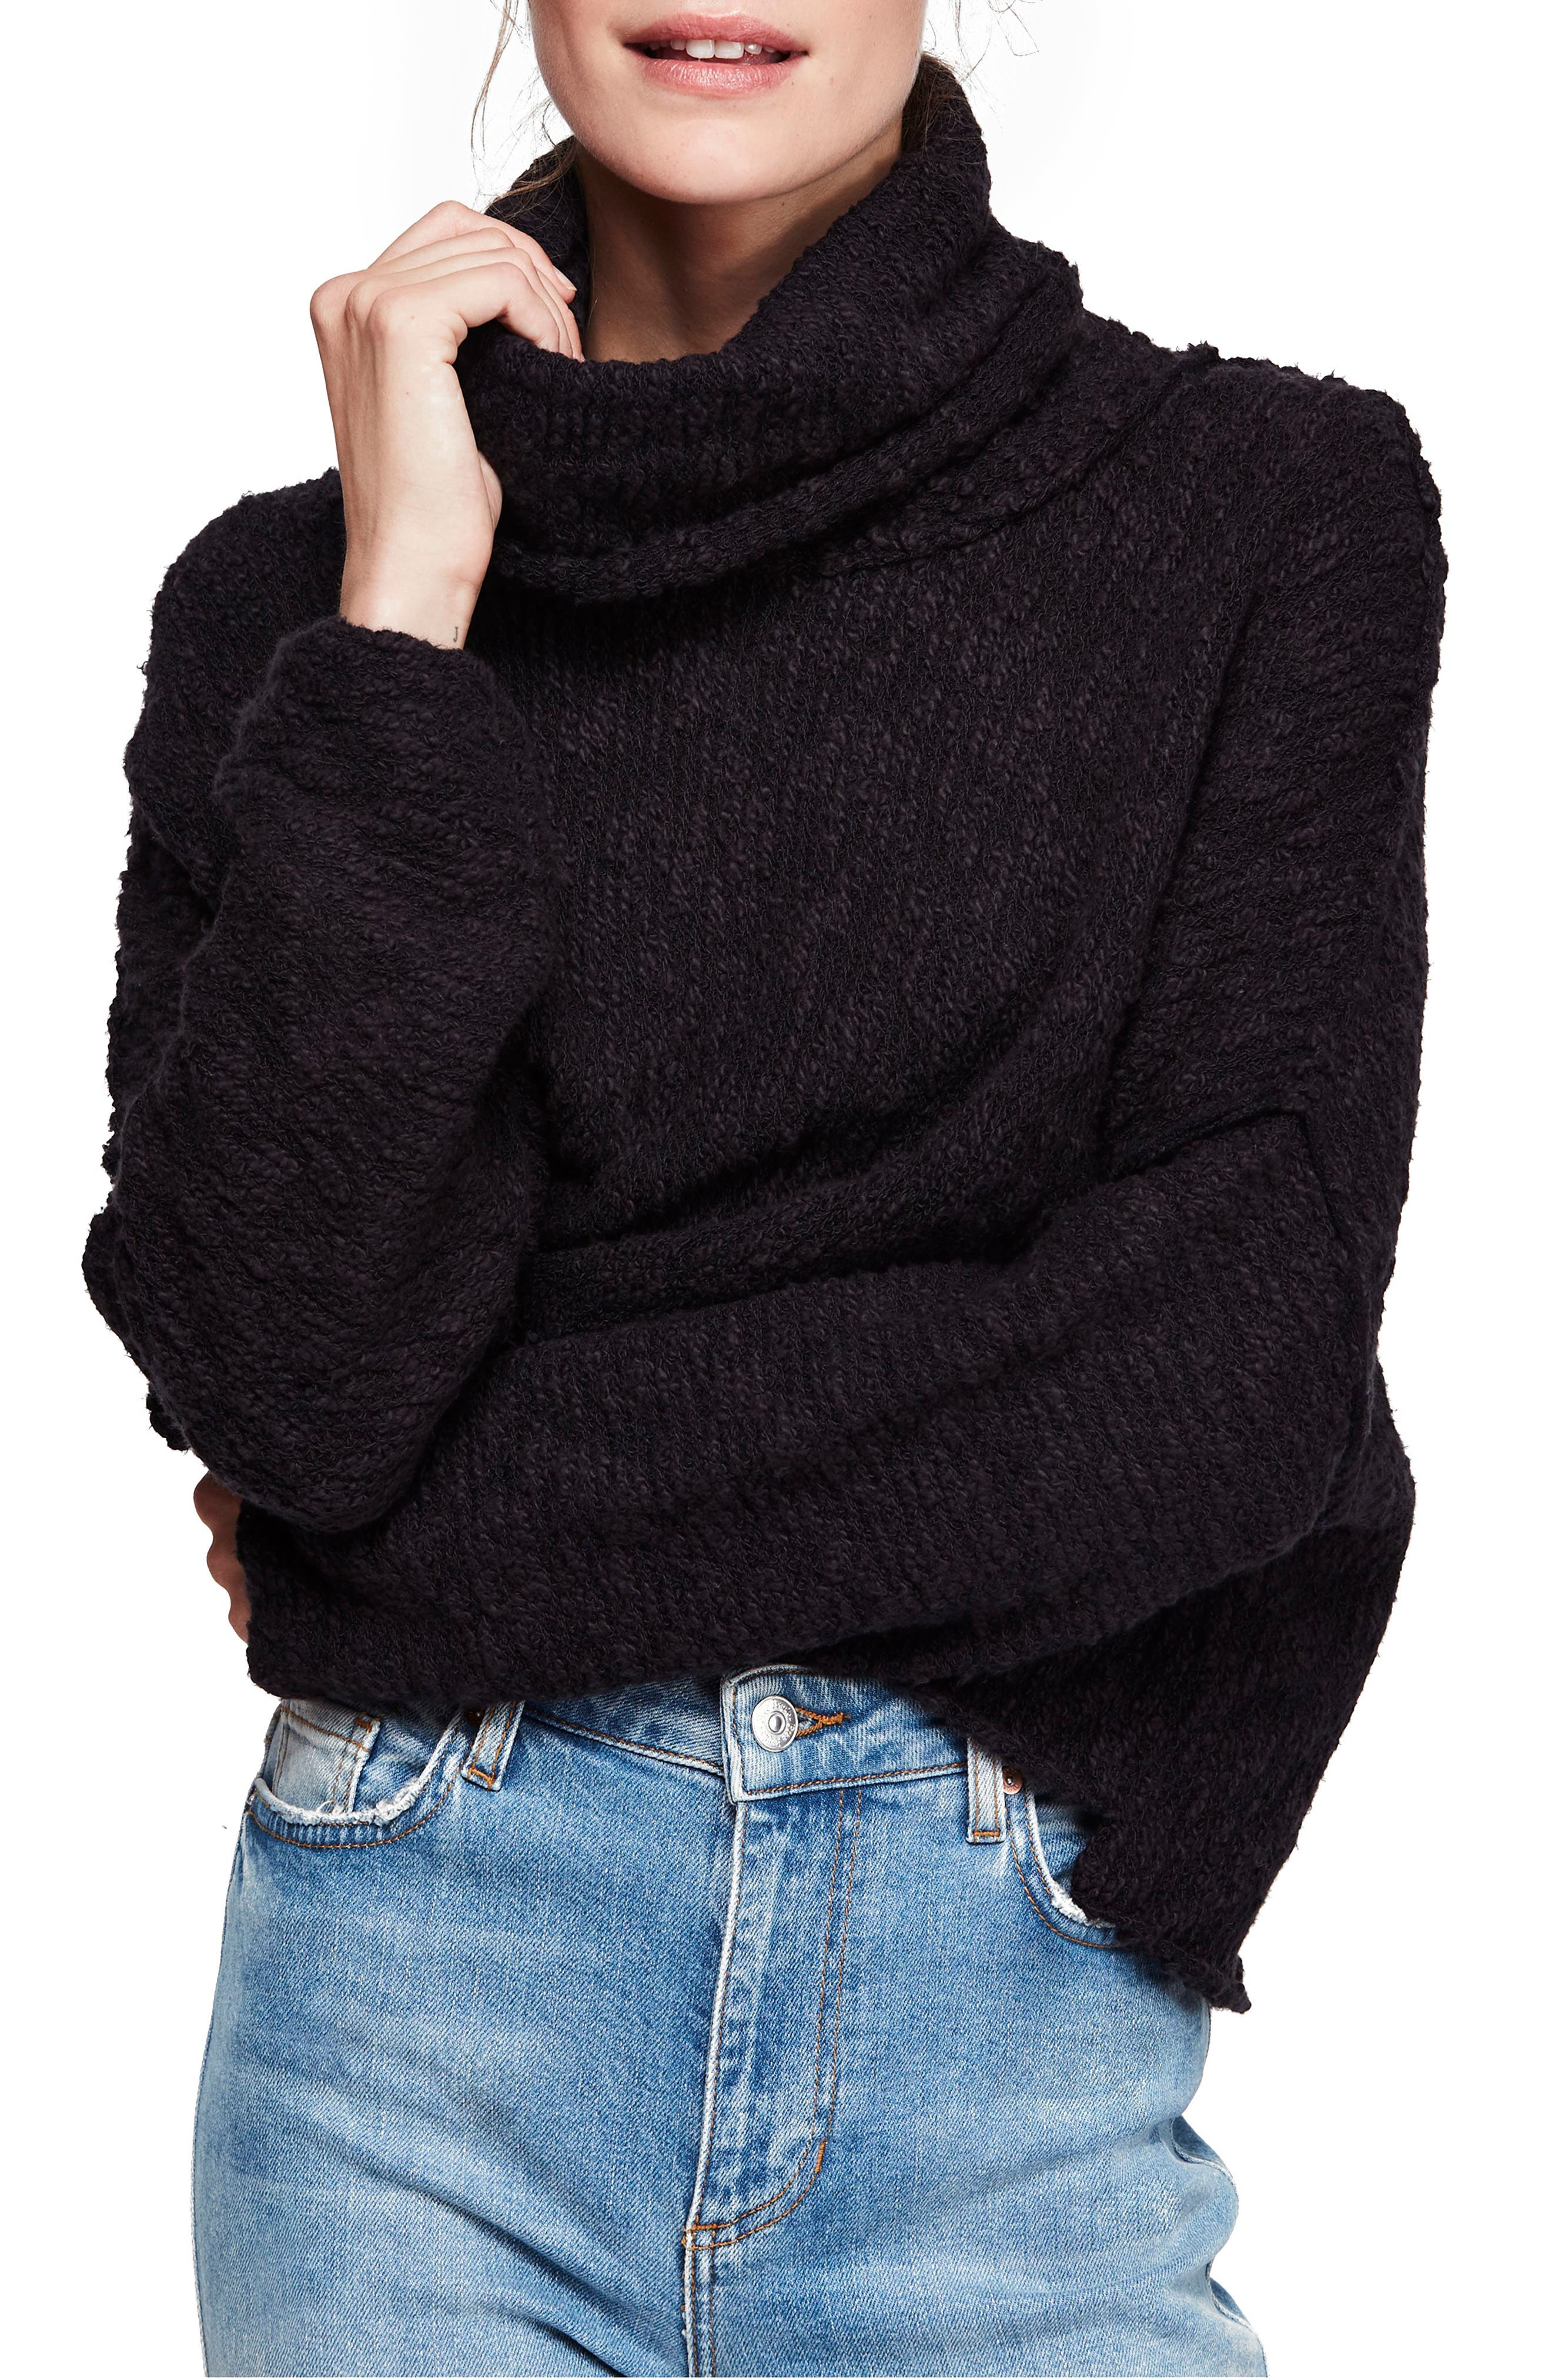 Big Easy Cowl Neck Crop Sweater, Main, color, BLACK